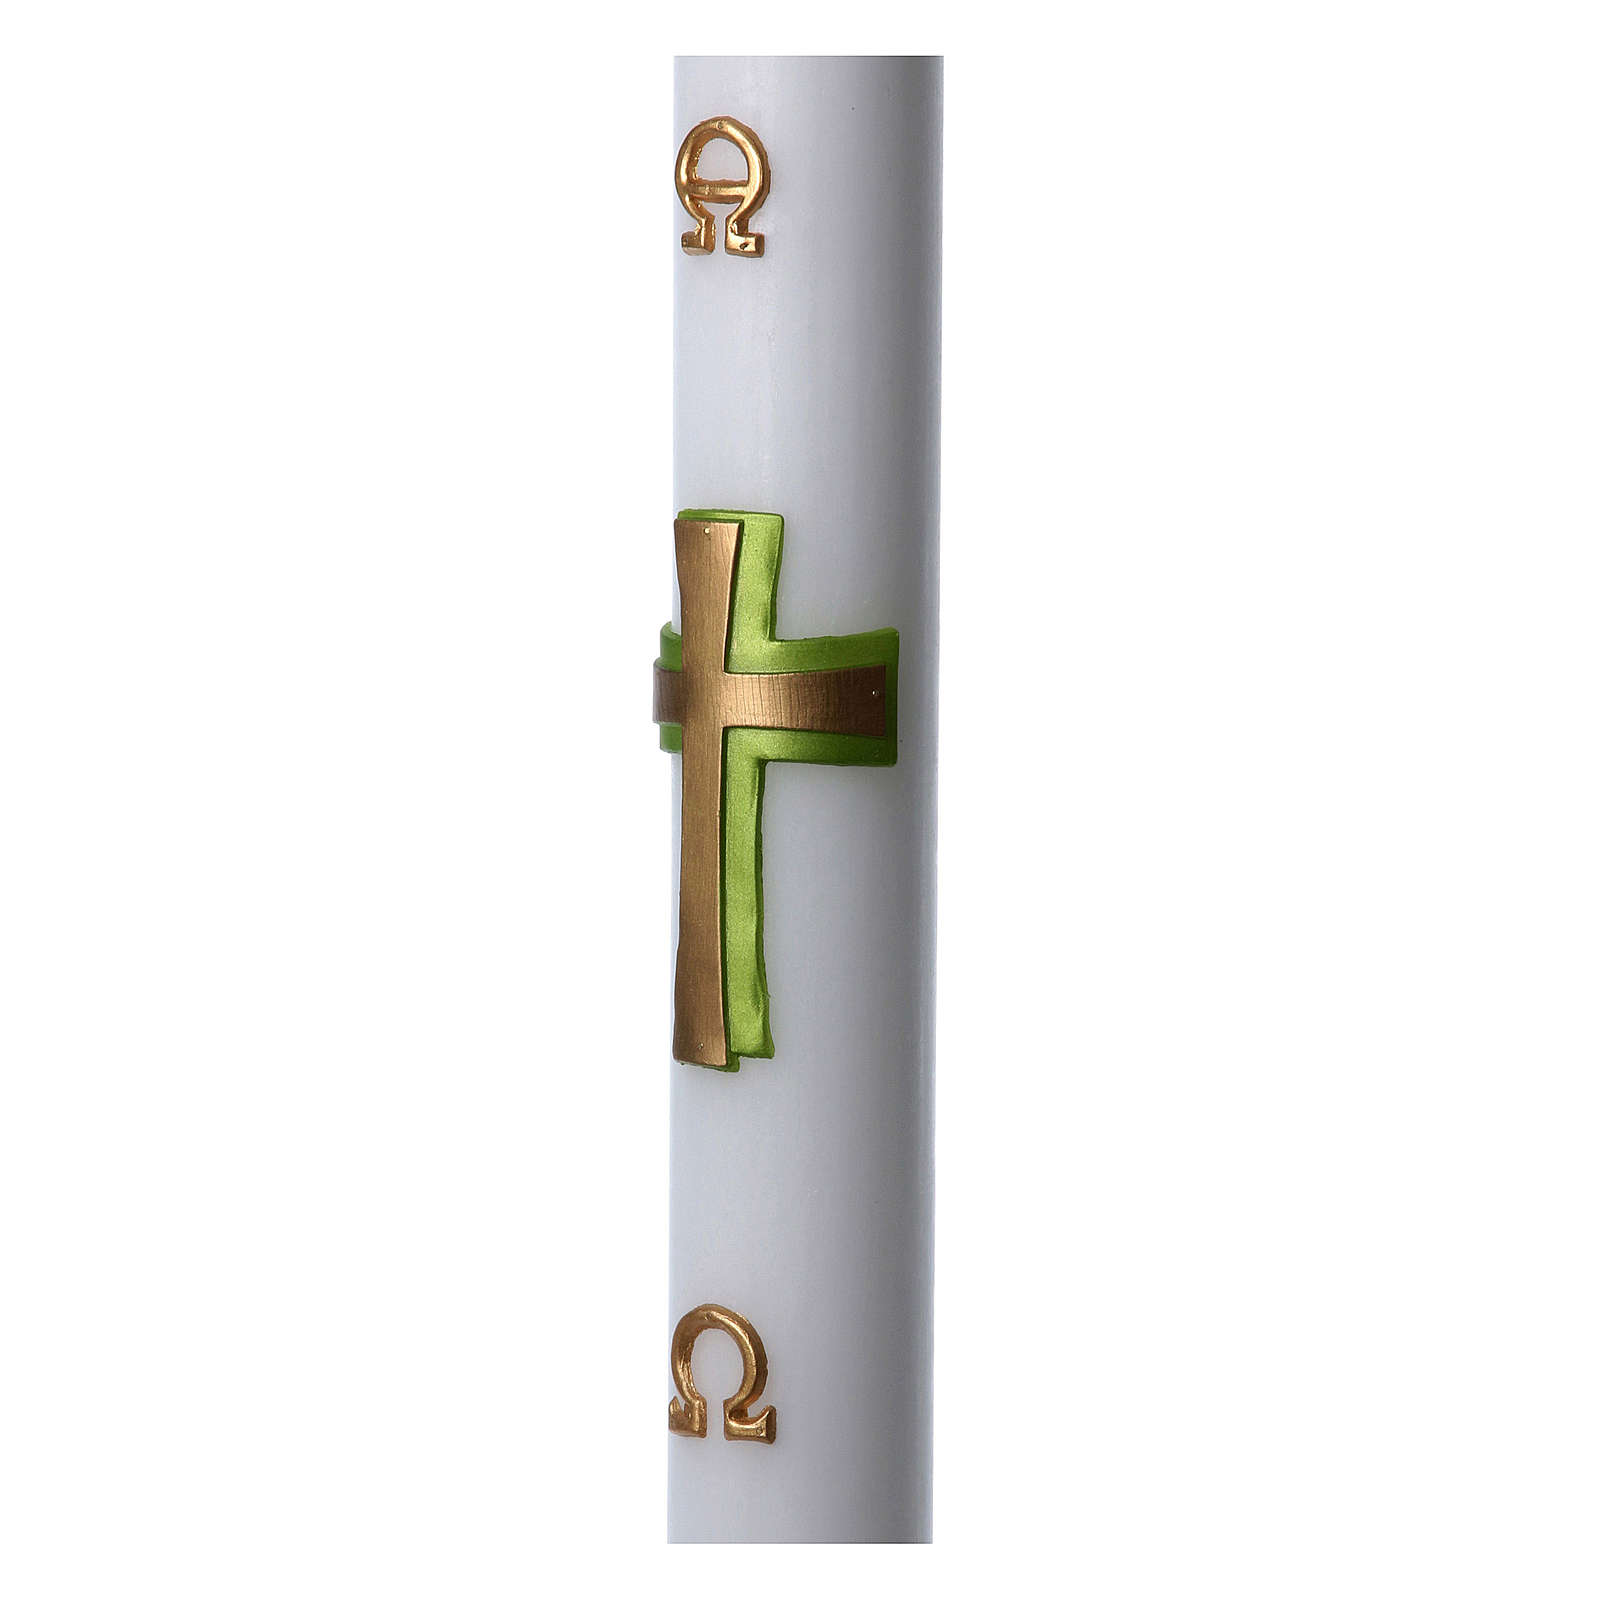 Cero pasquale cera bianca Croce Rilievo verde 8x120 cm 3